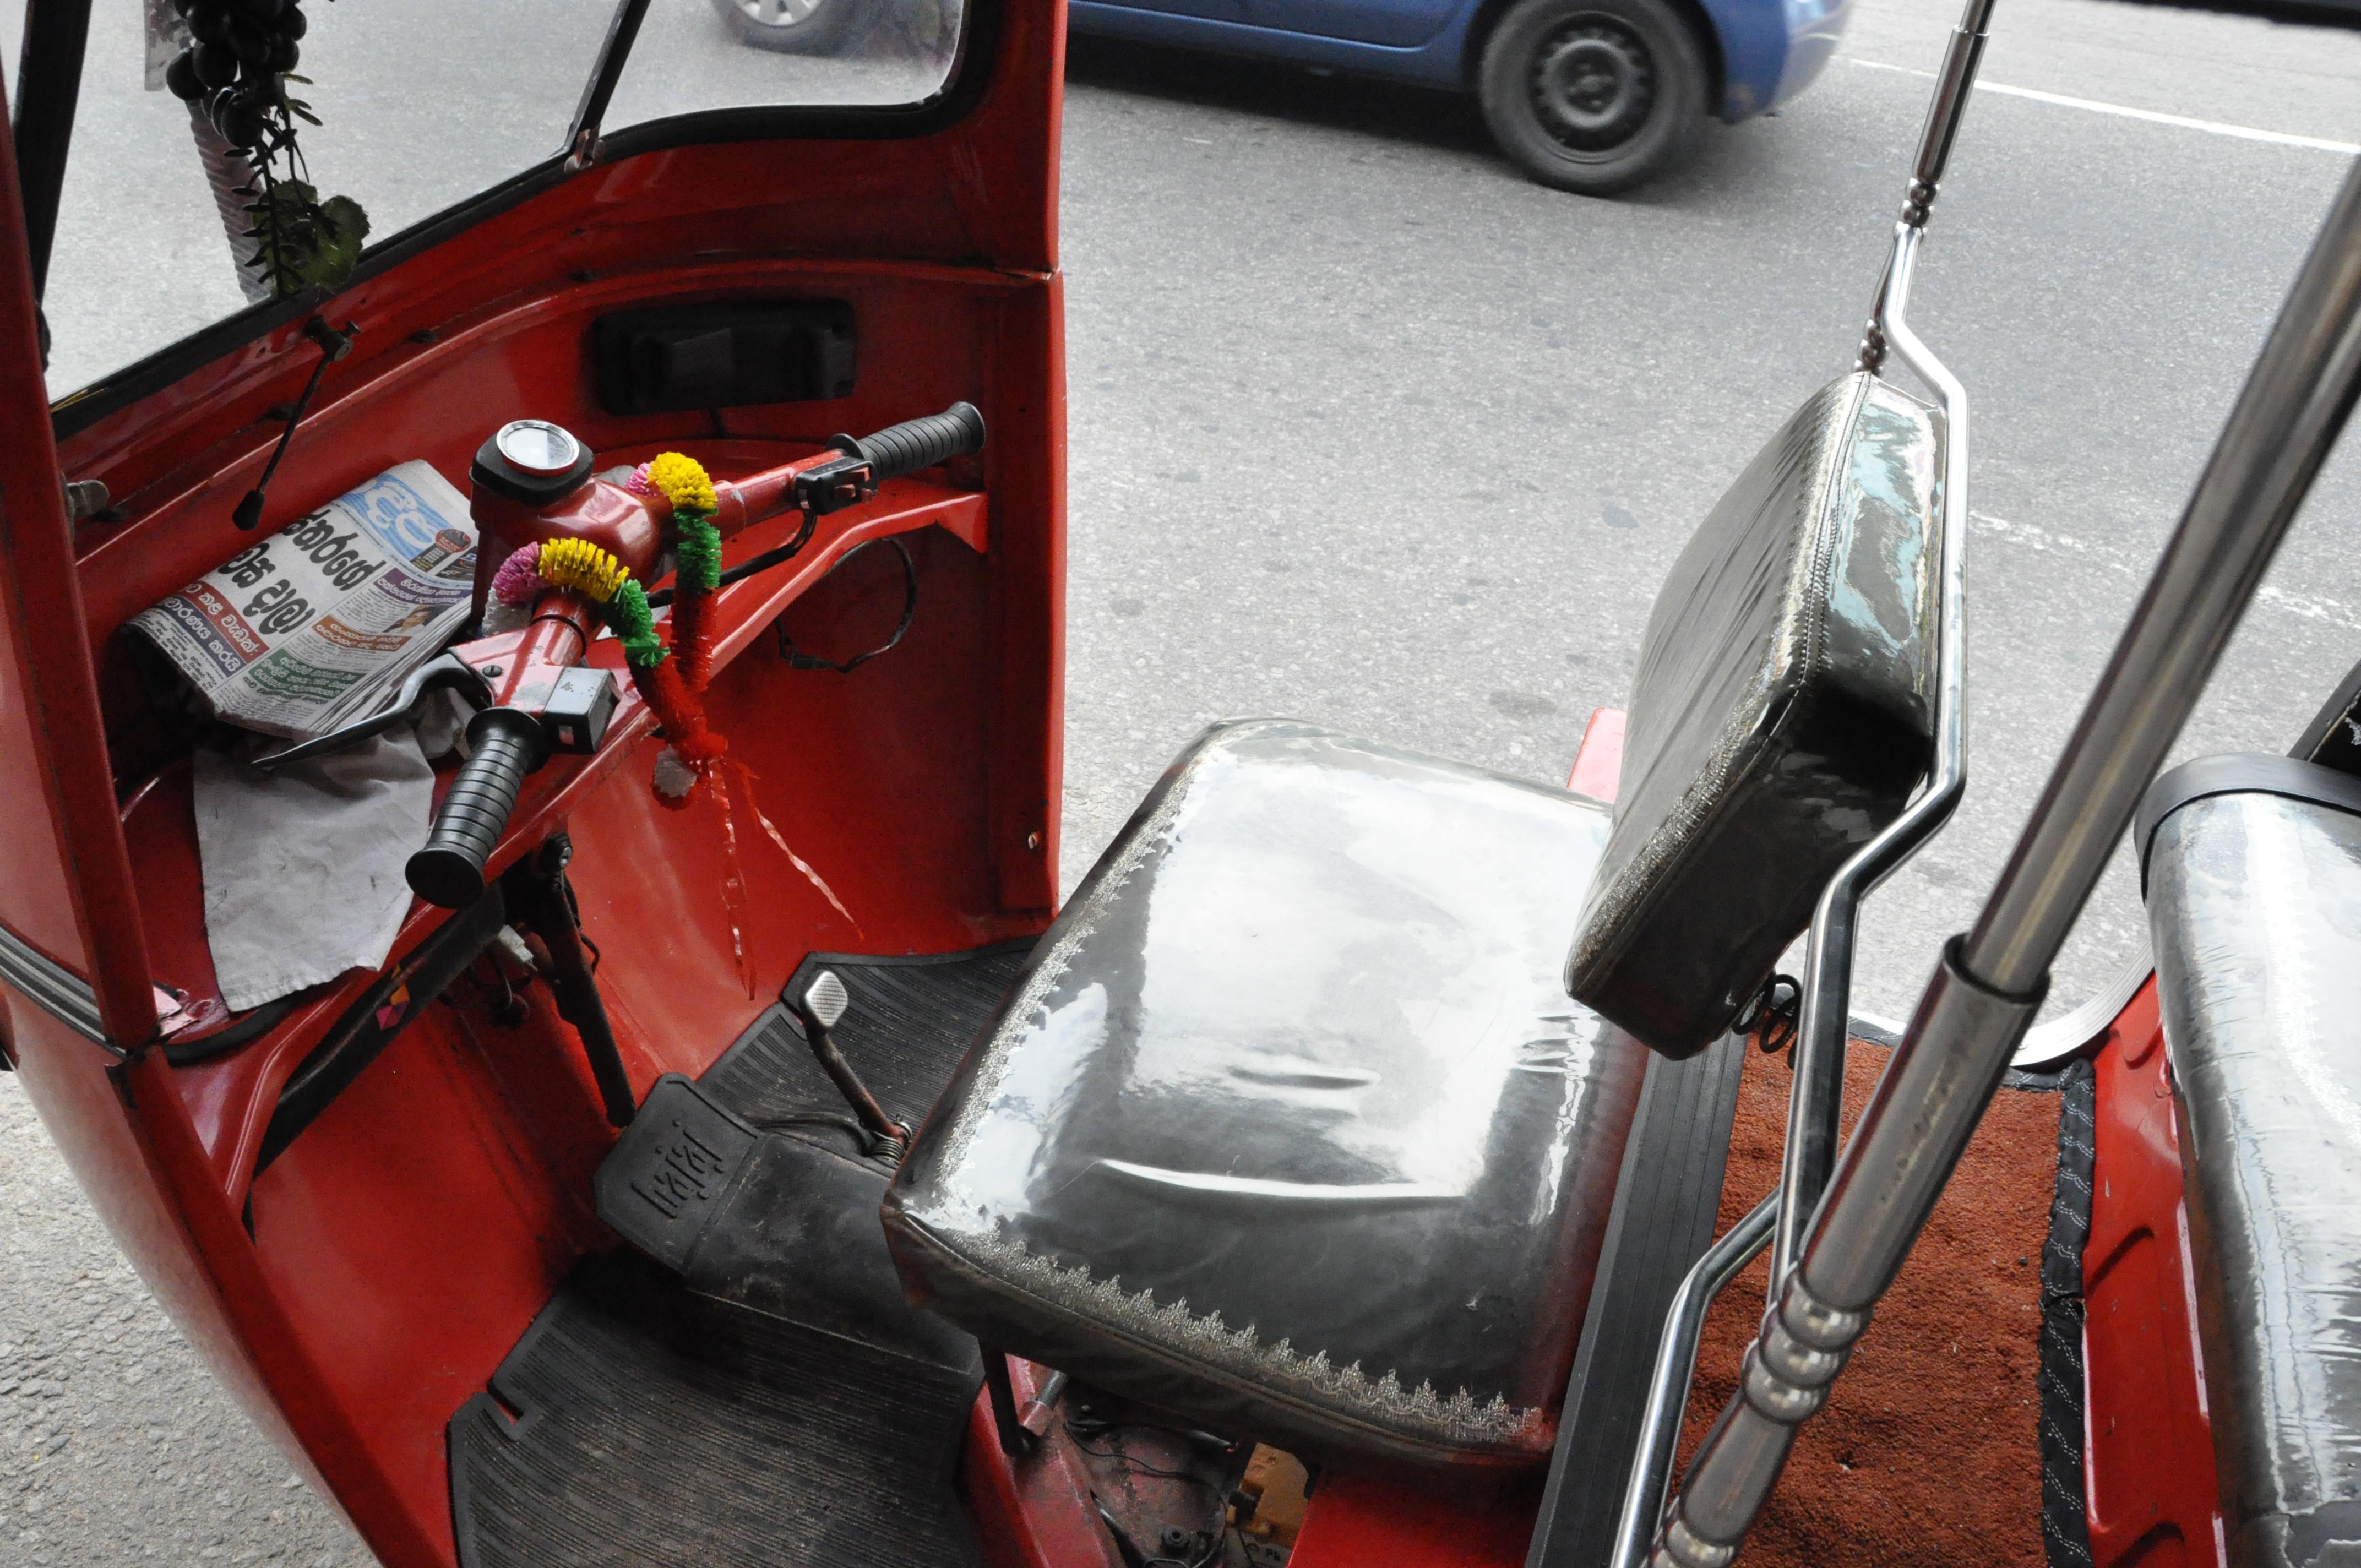 File:DKoehl interior front colombo auto rickshaw front.JPG - Wikimedia ...